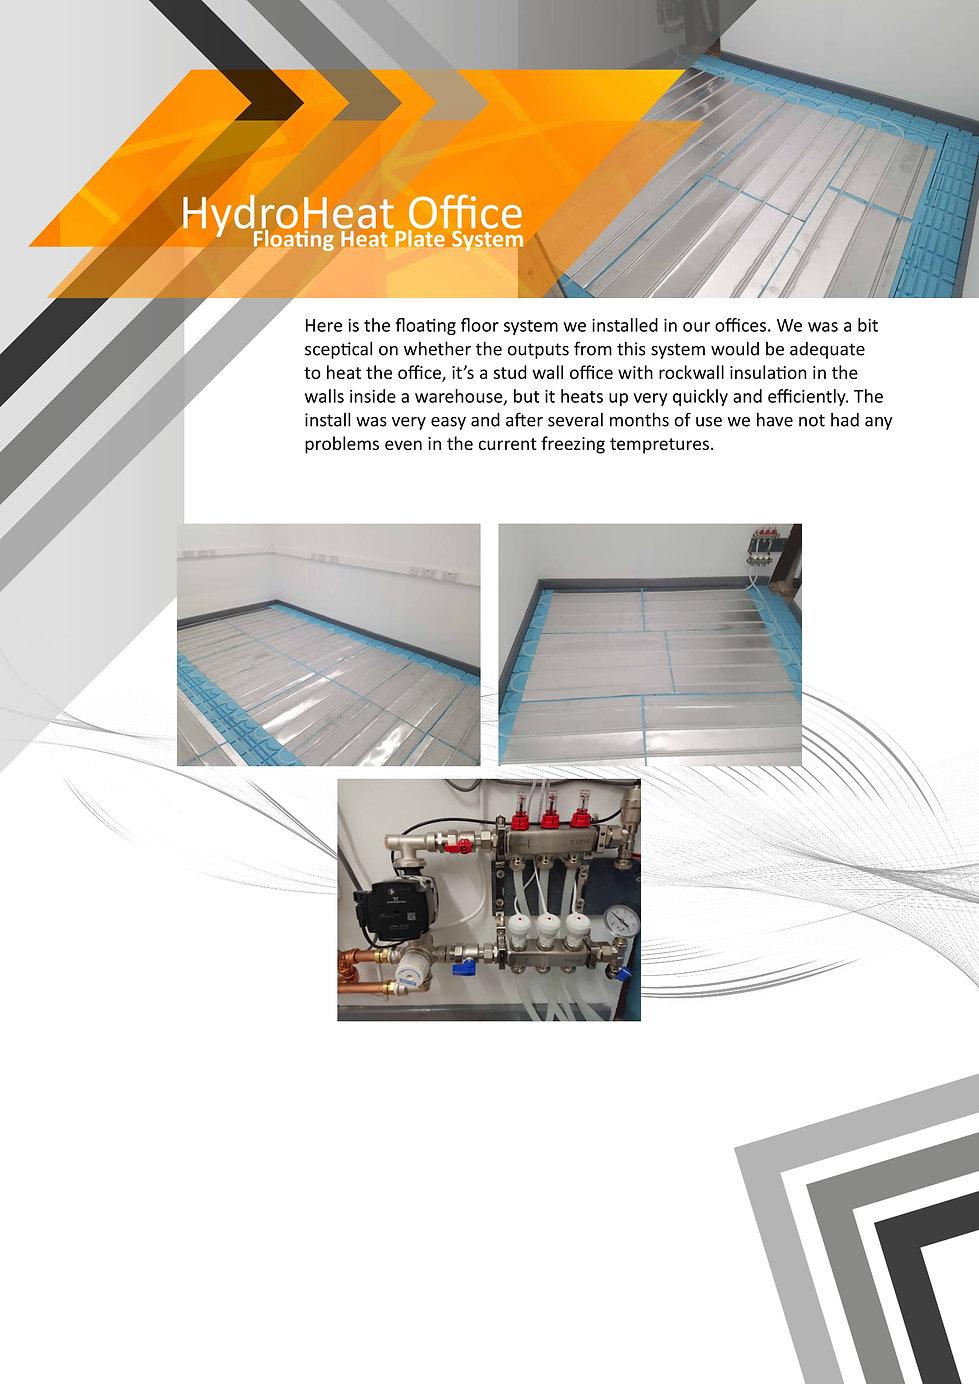 HydroHeat Office-1.jpg